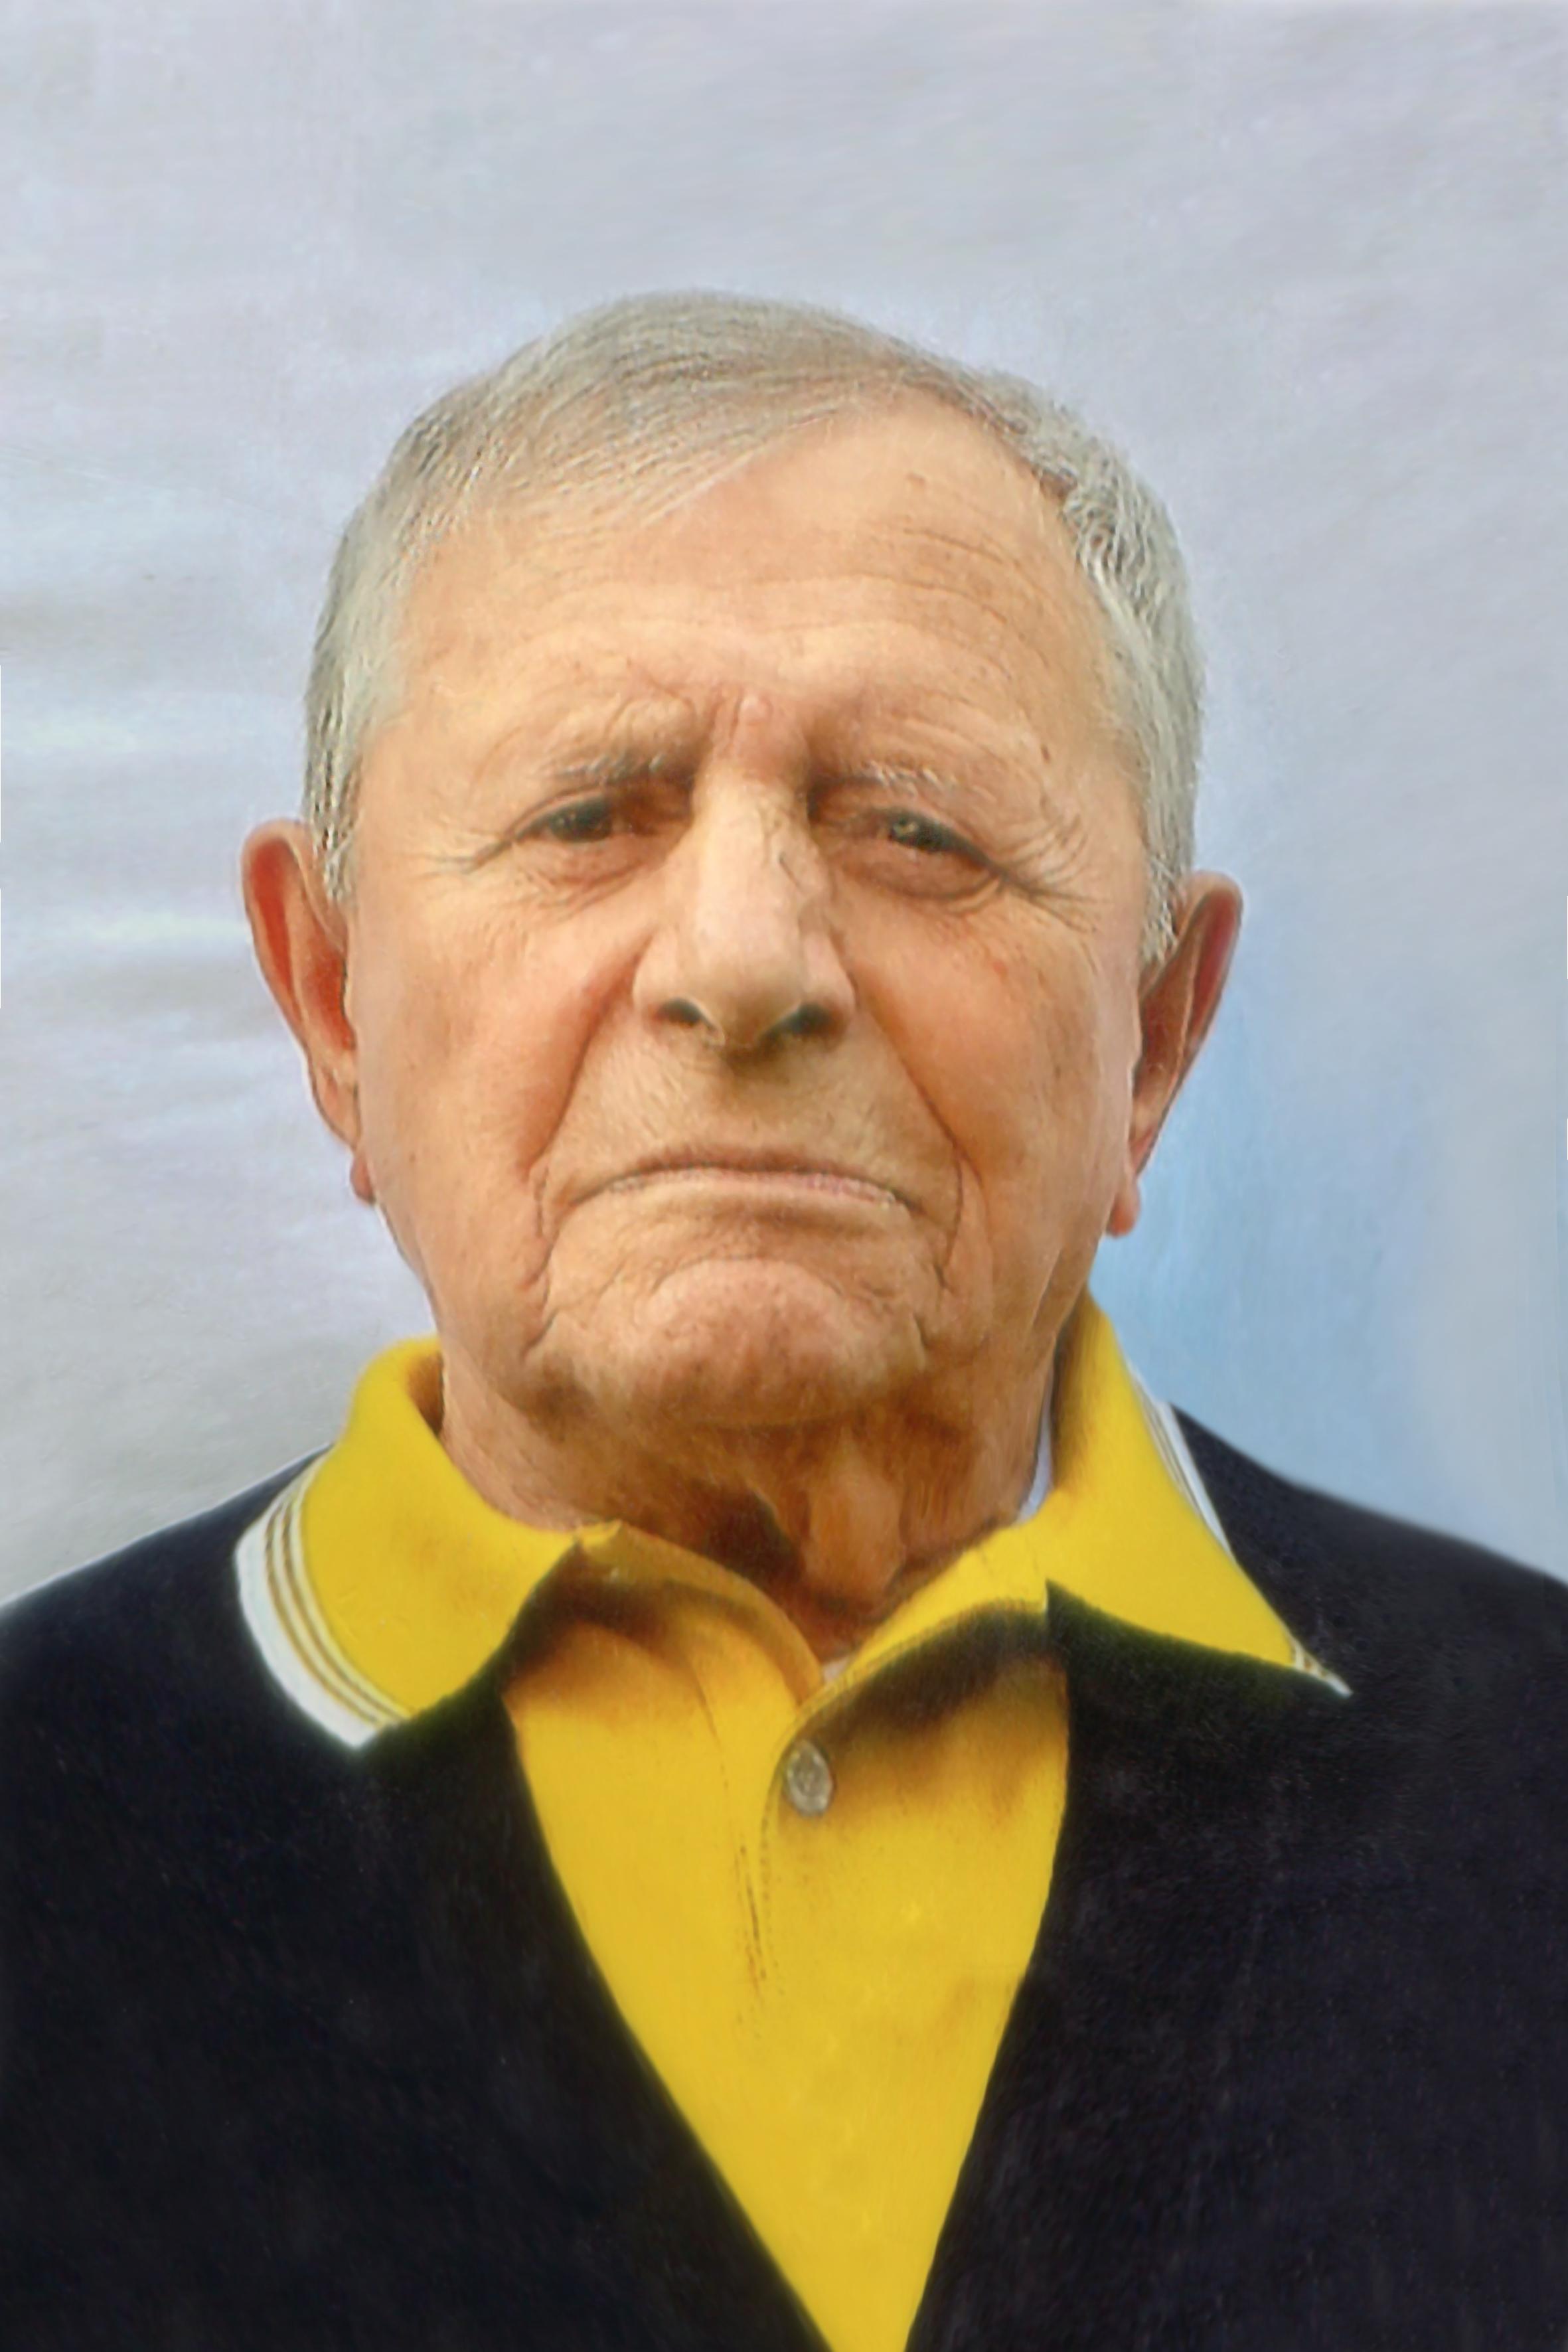 SERGIO DAVOLI